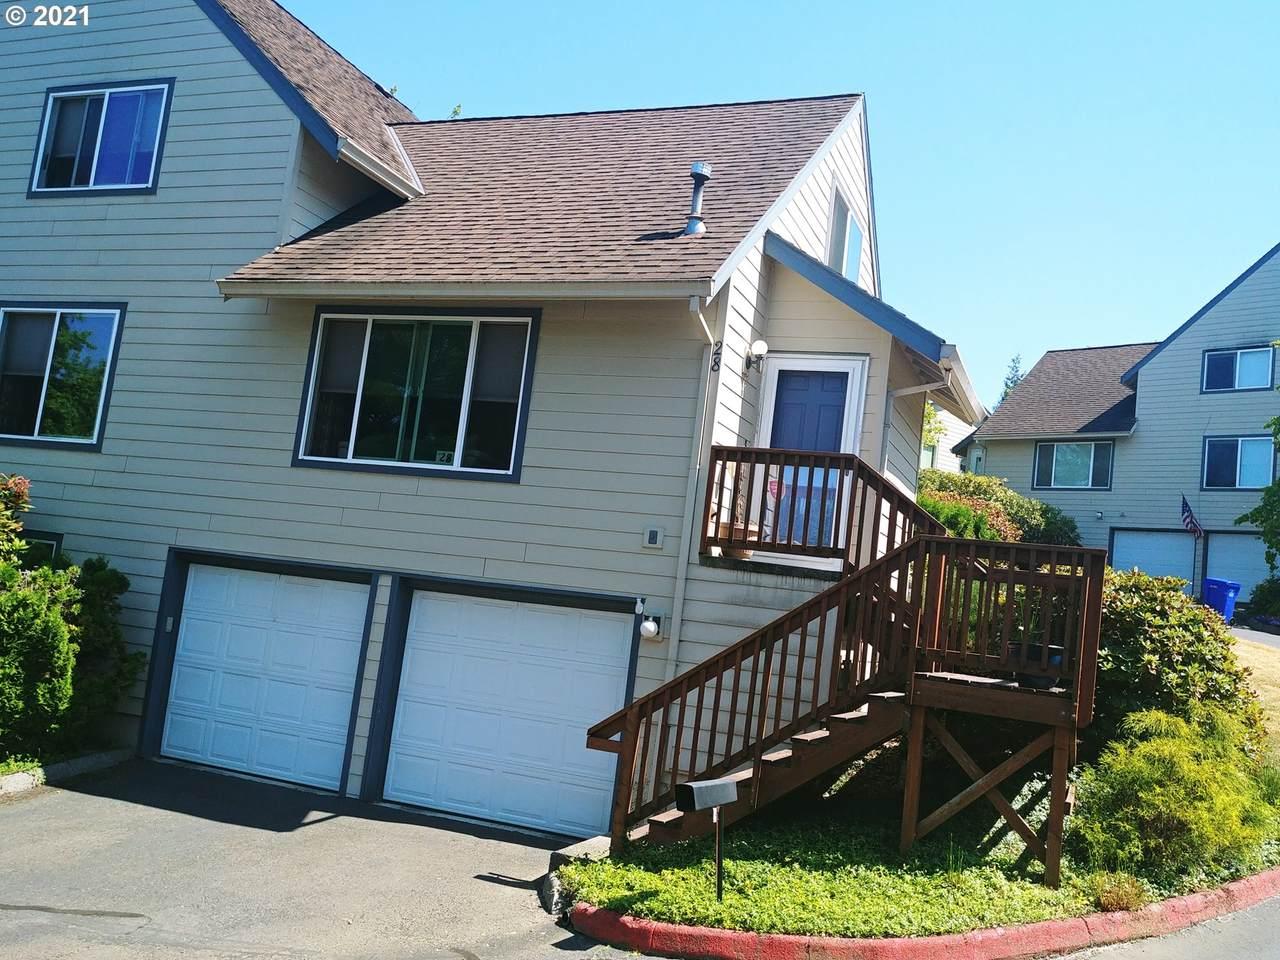 371 Village Squire Ave - Photo 1